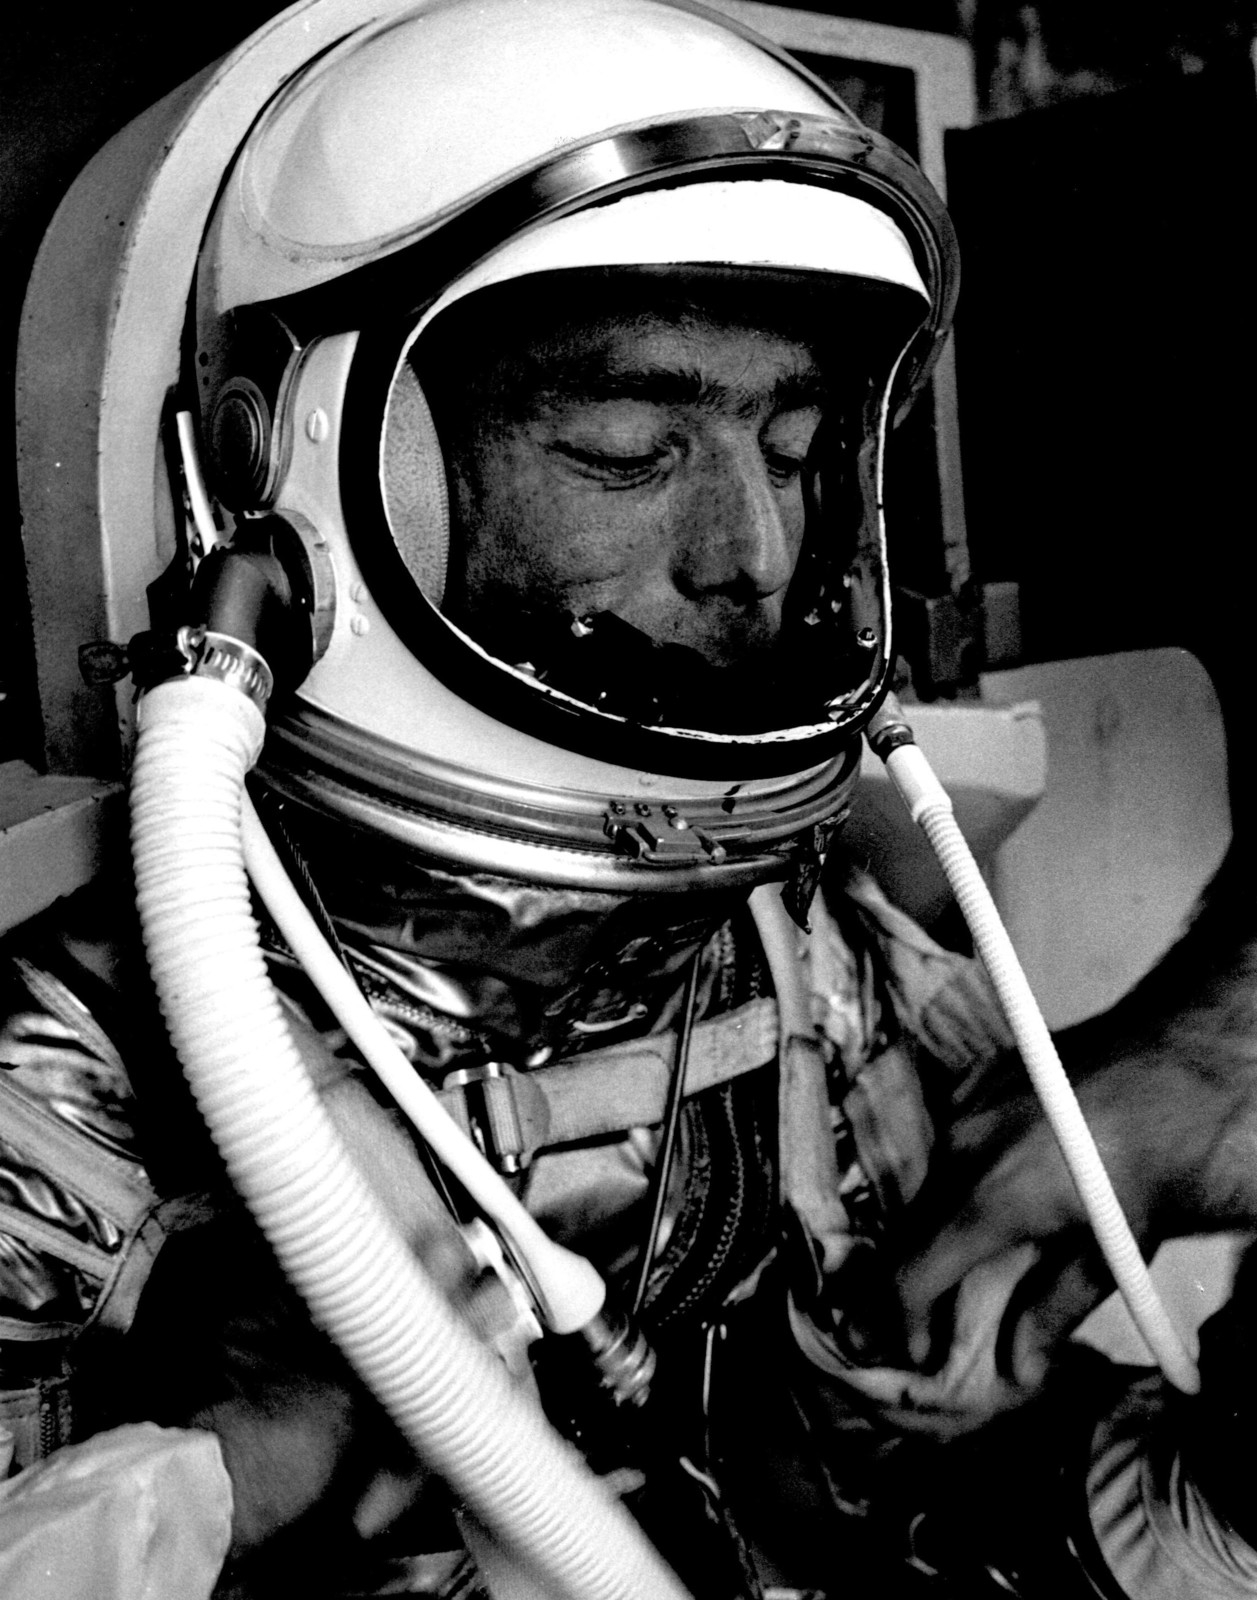 Photograph of Astronaut Malcolm Scott Carpenter Adjusting his Straps Prior to Aurora 7 Launch